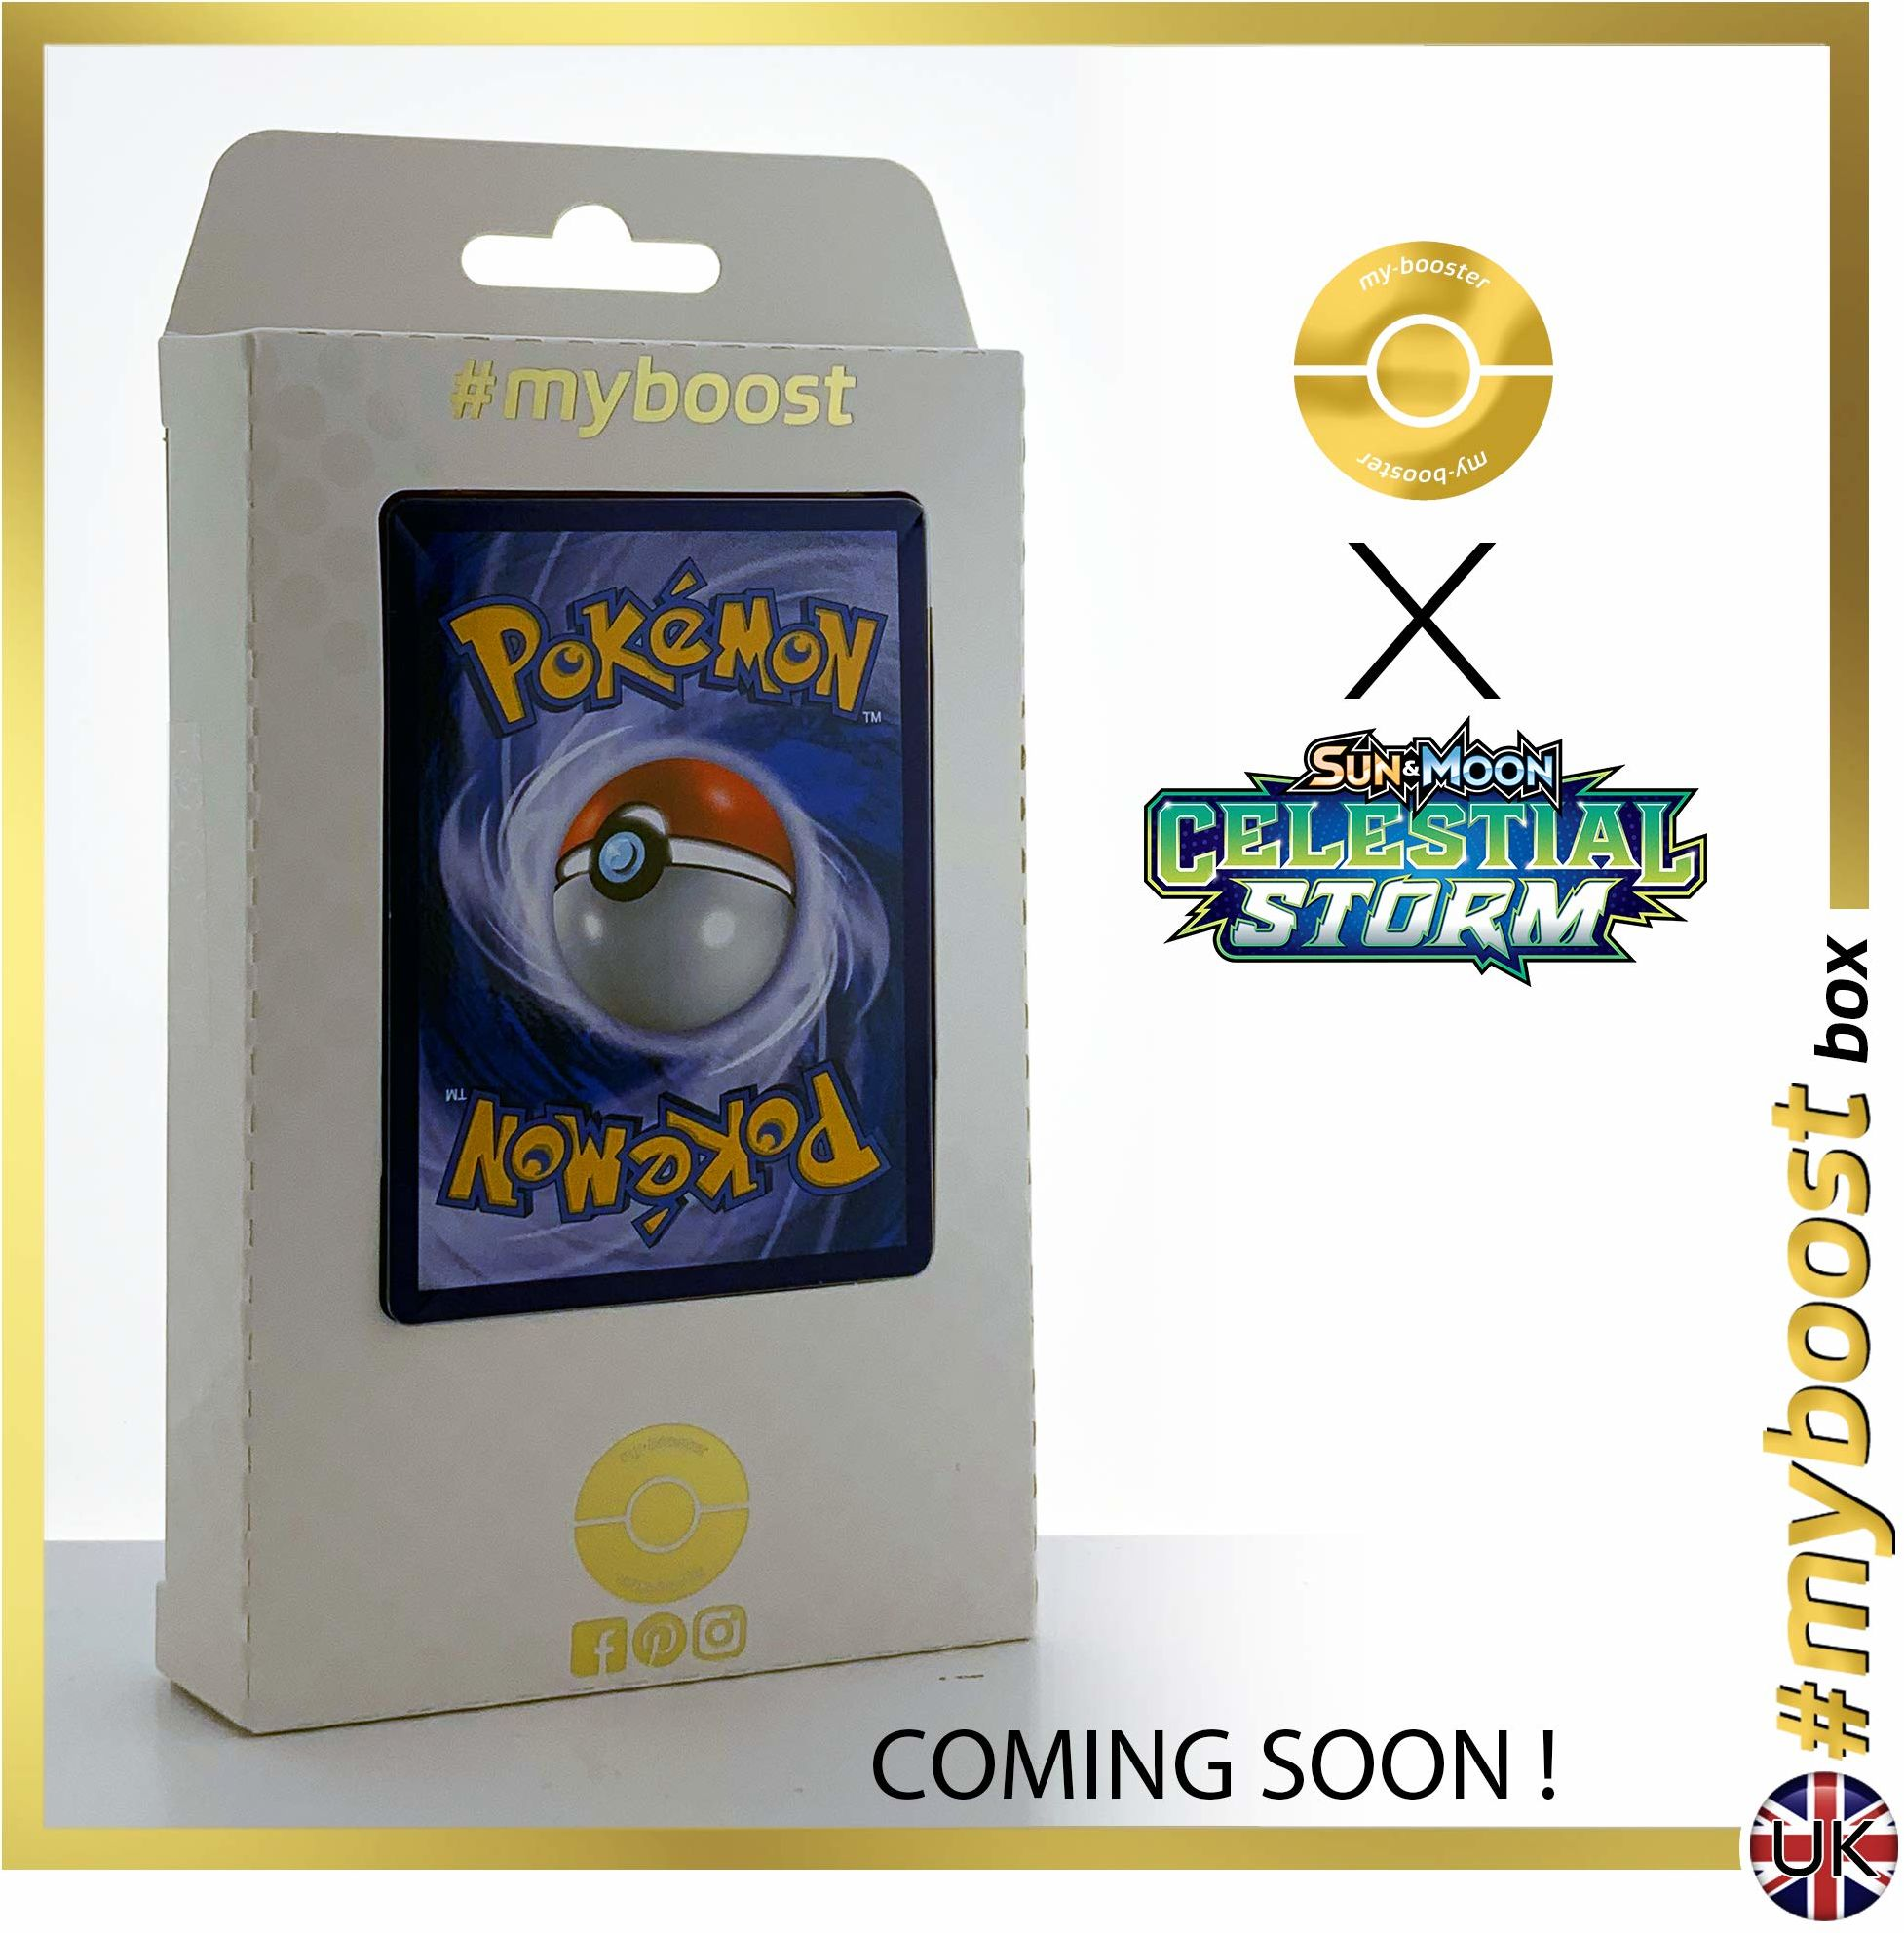 Latios 108/168 Holo Prism - #myboost X Sun & Moon 7 Celestrial Storm - pudełko 10 angielskich kart pokemon